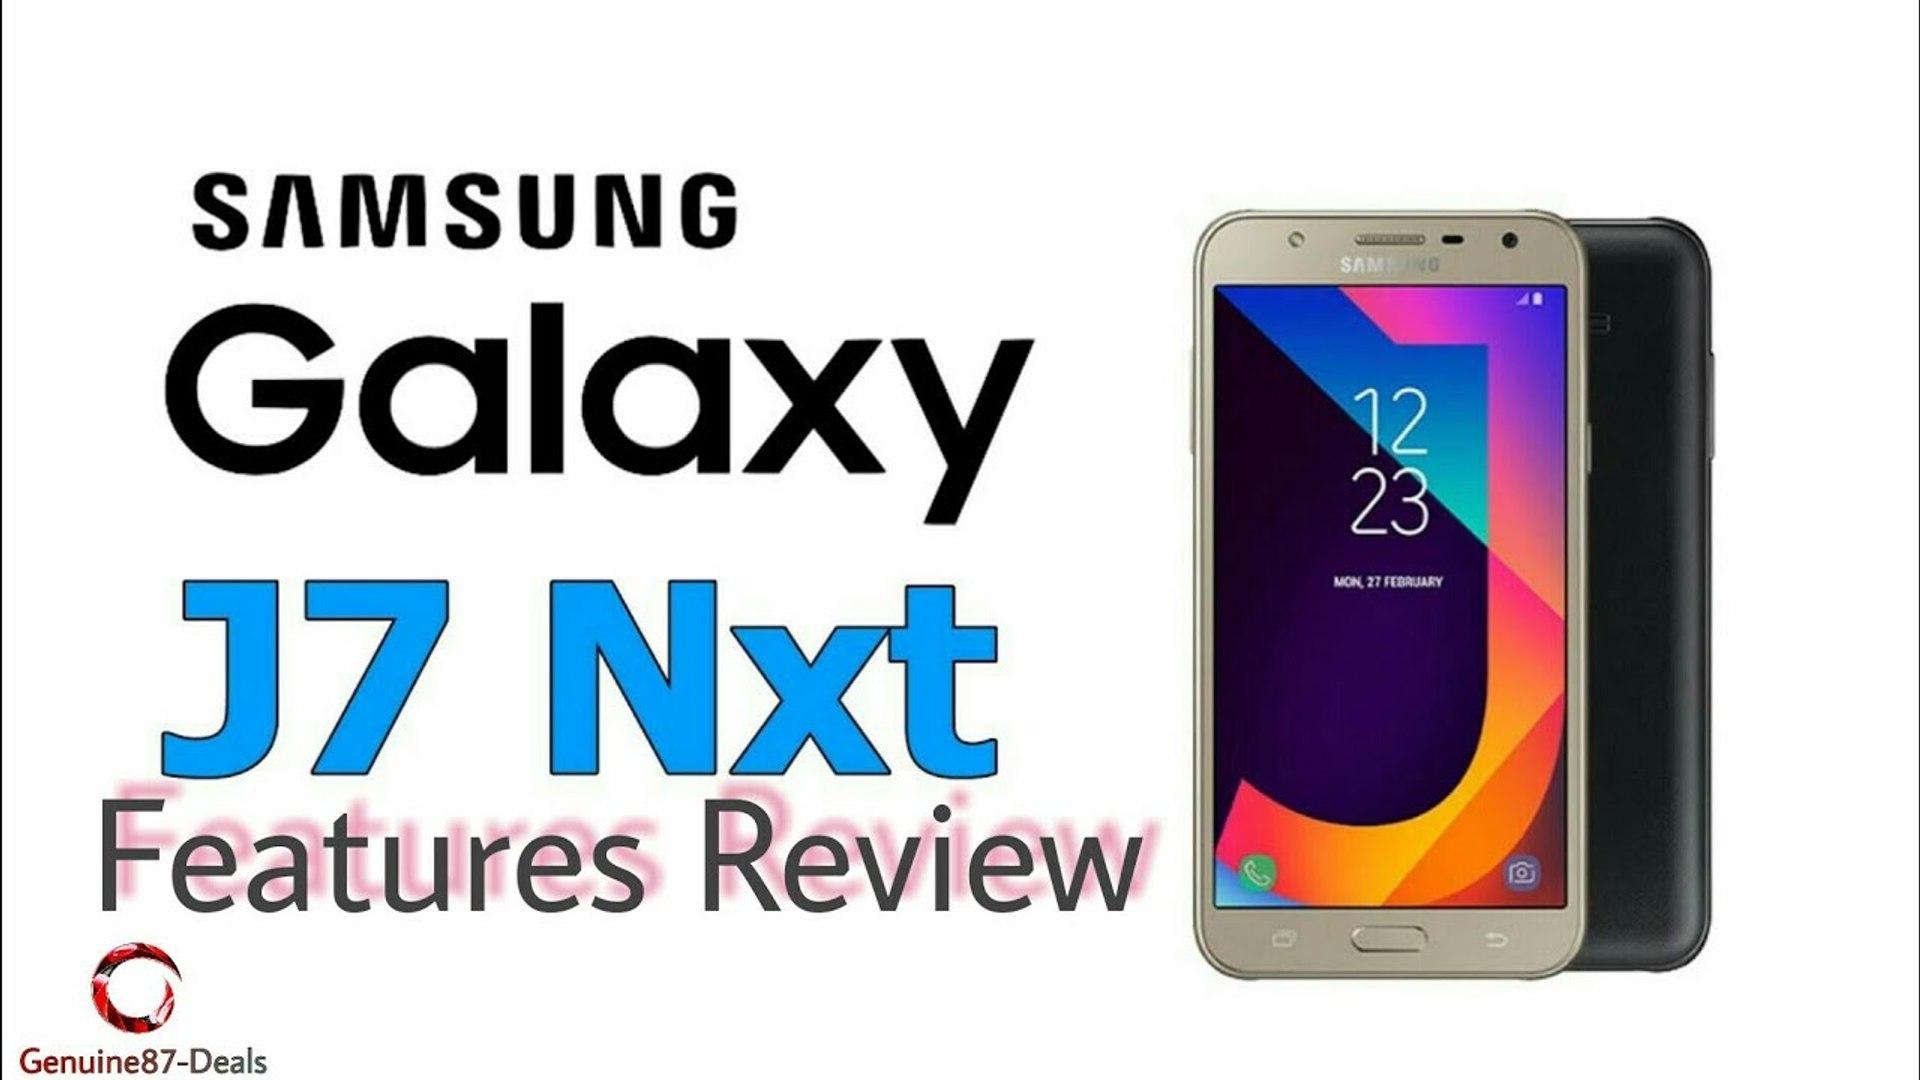 samsung galaxy j7 nxt features 2017 video I samsung galaxy on nxt (64 gb) (3gb ram) Genuine87-Deals.